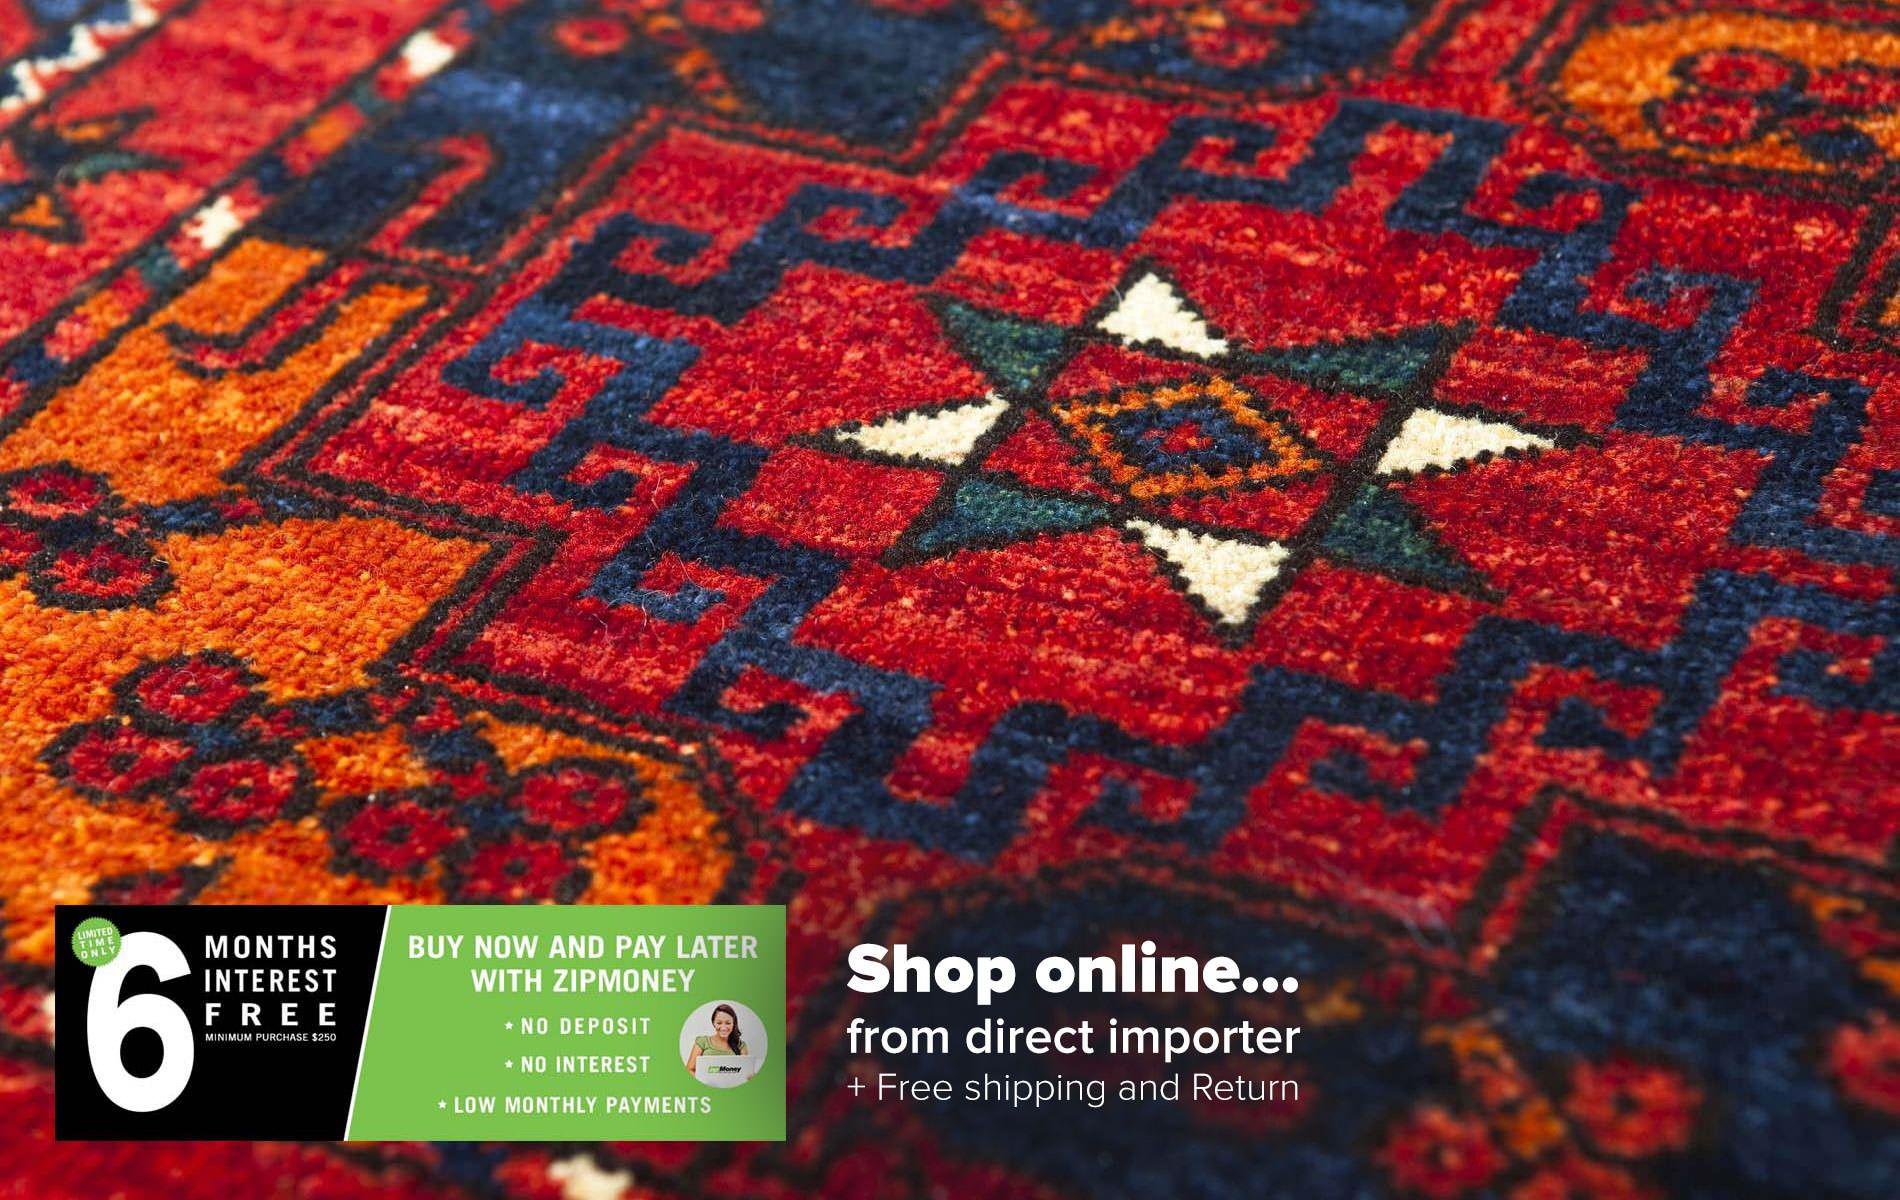 Persian Rugs Australia Offers A Beautiful Range Of Designer Oriental Wool Handmade In Melbourne Sydney